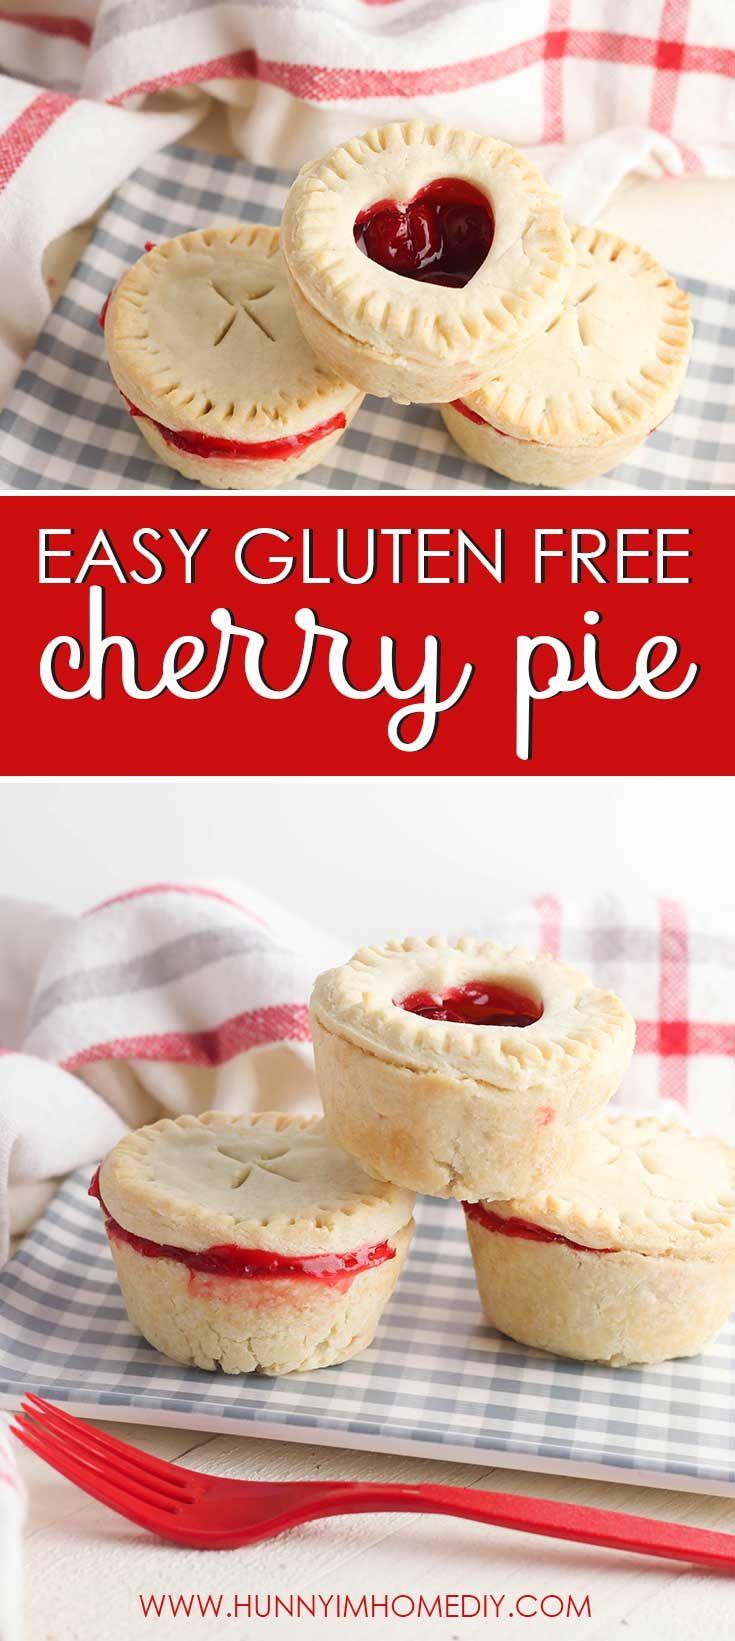 Easy gluten free cherry pie cups hunny im home diy in